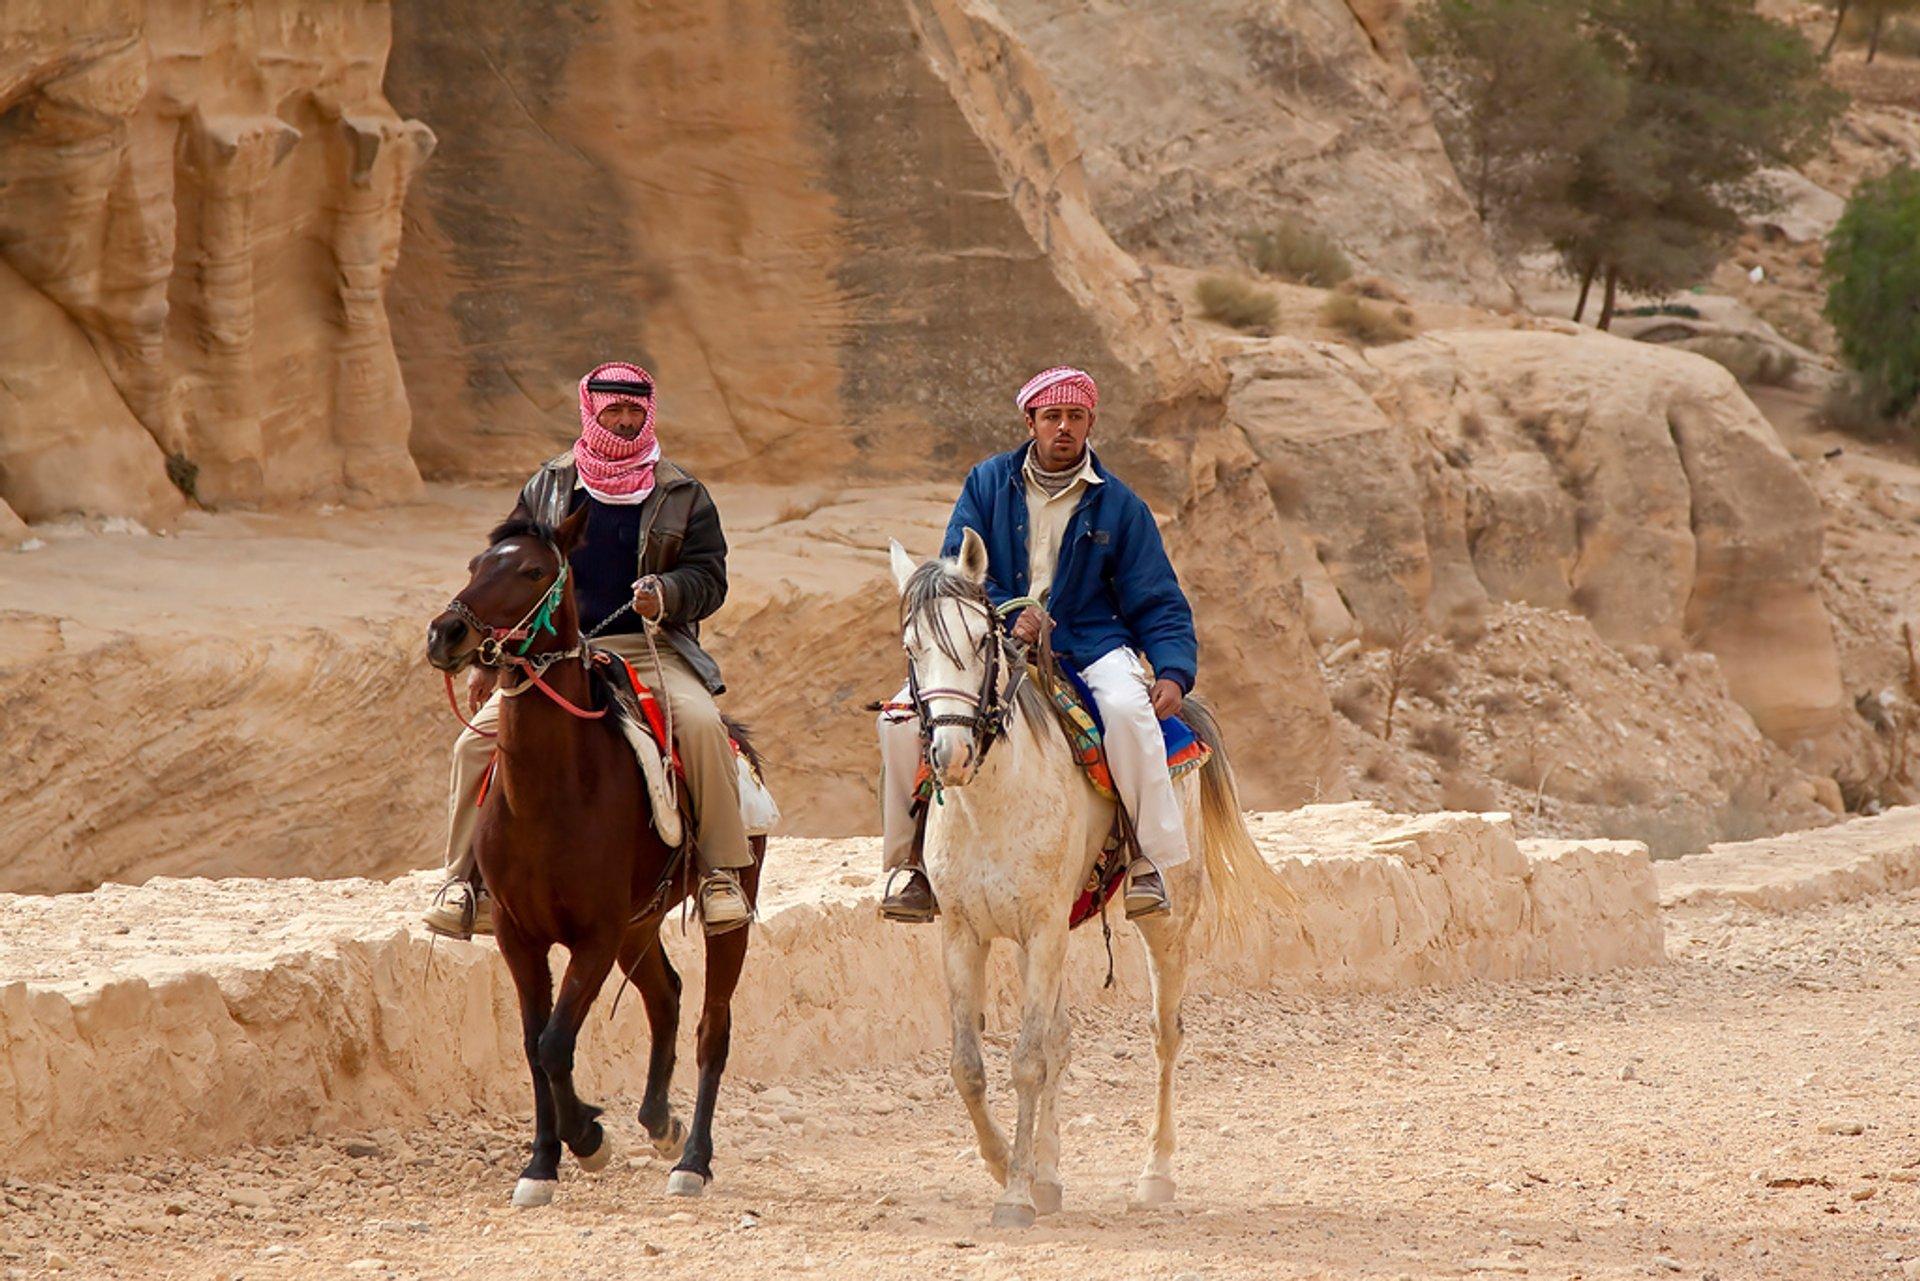 Horseback Riding in Jordan 2019 - Best Time